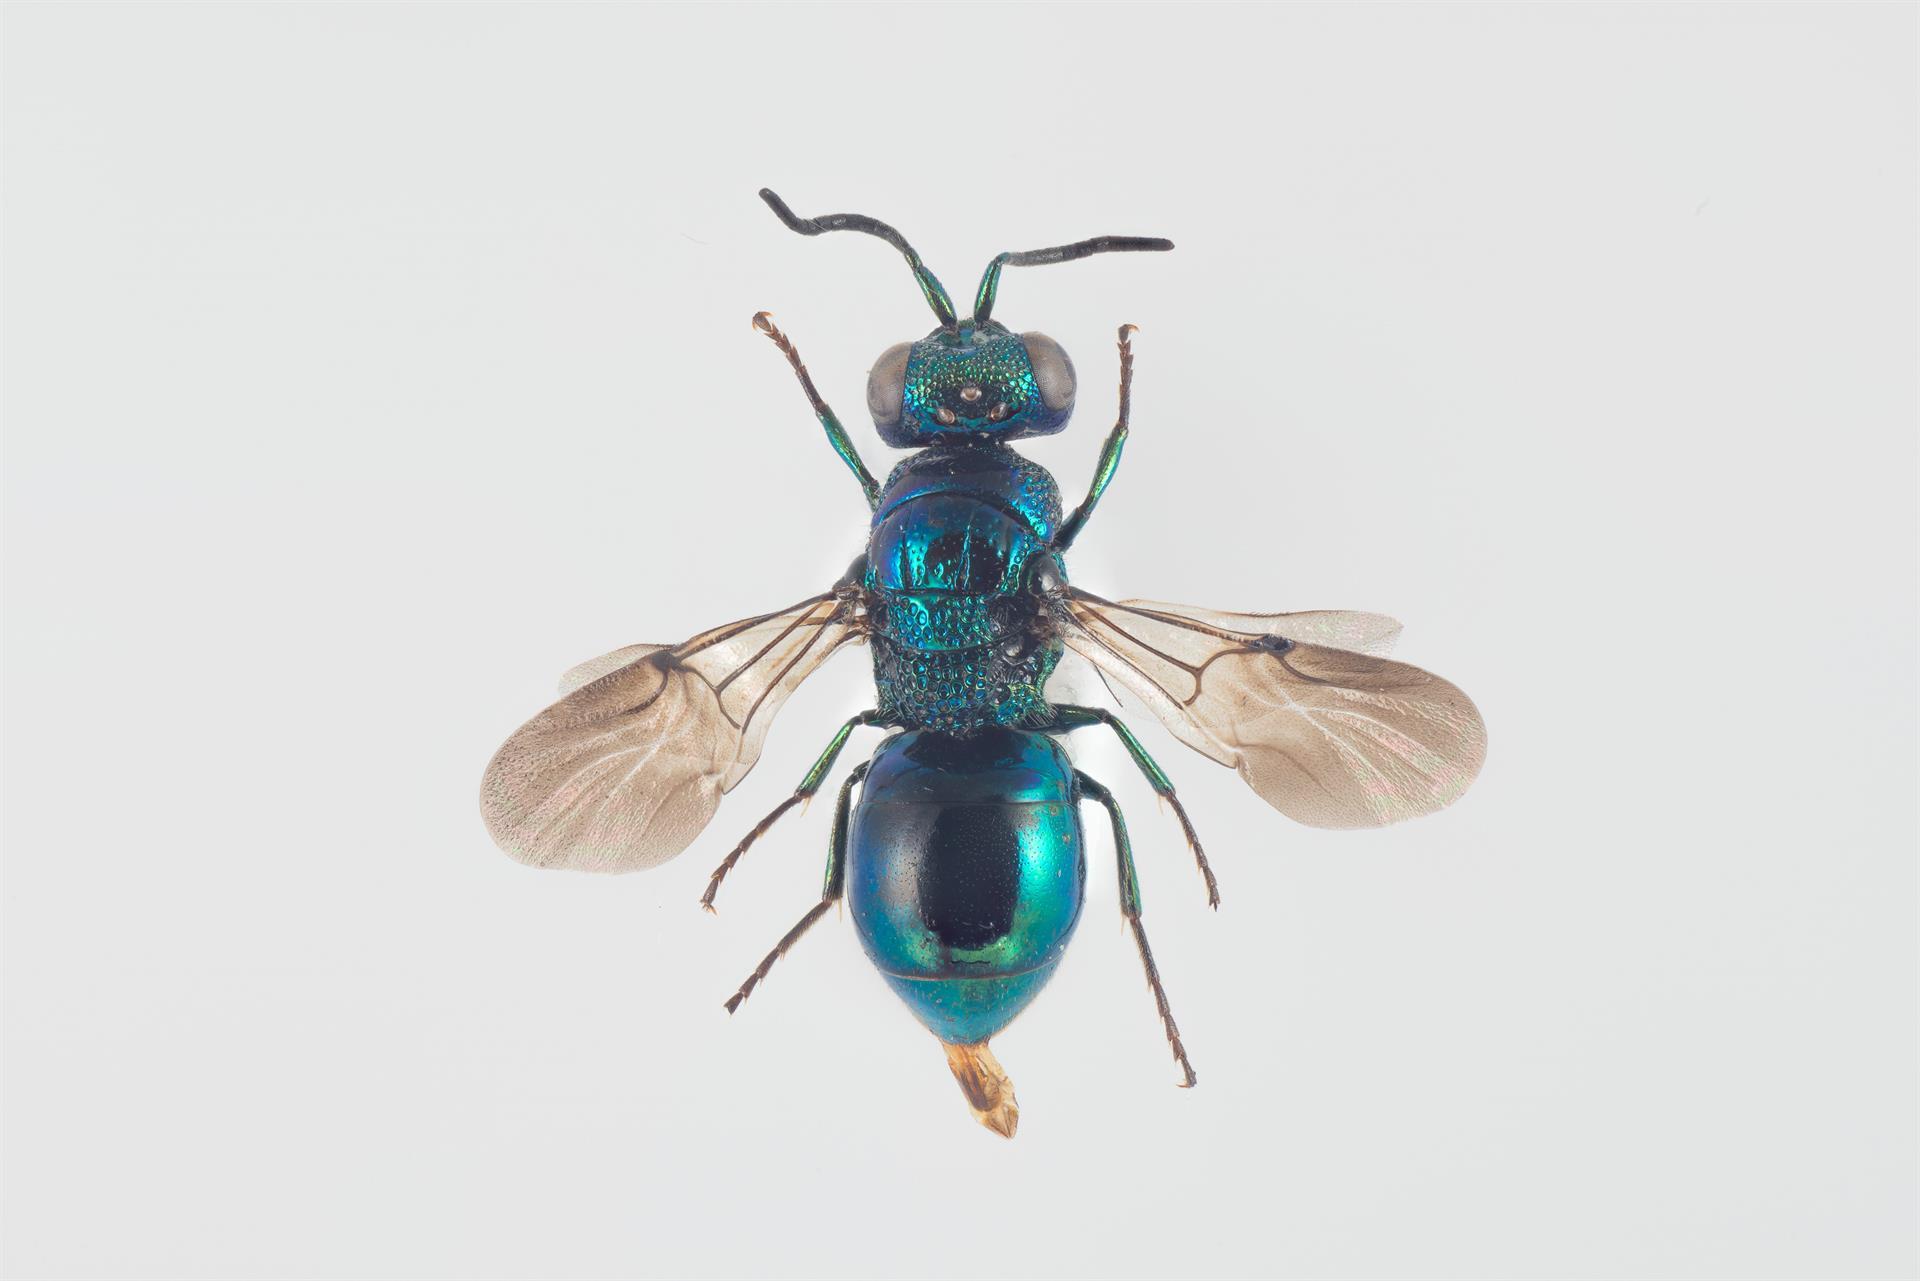 Omalus puncticollis,  Photo: Arnstein Staverløkk, Norsk Institutt for Naturforskning, CC BY 3.0